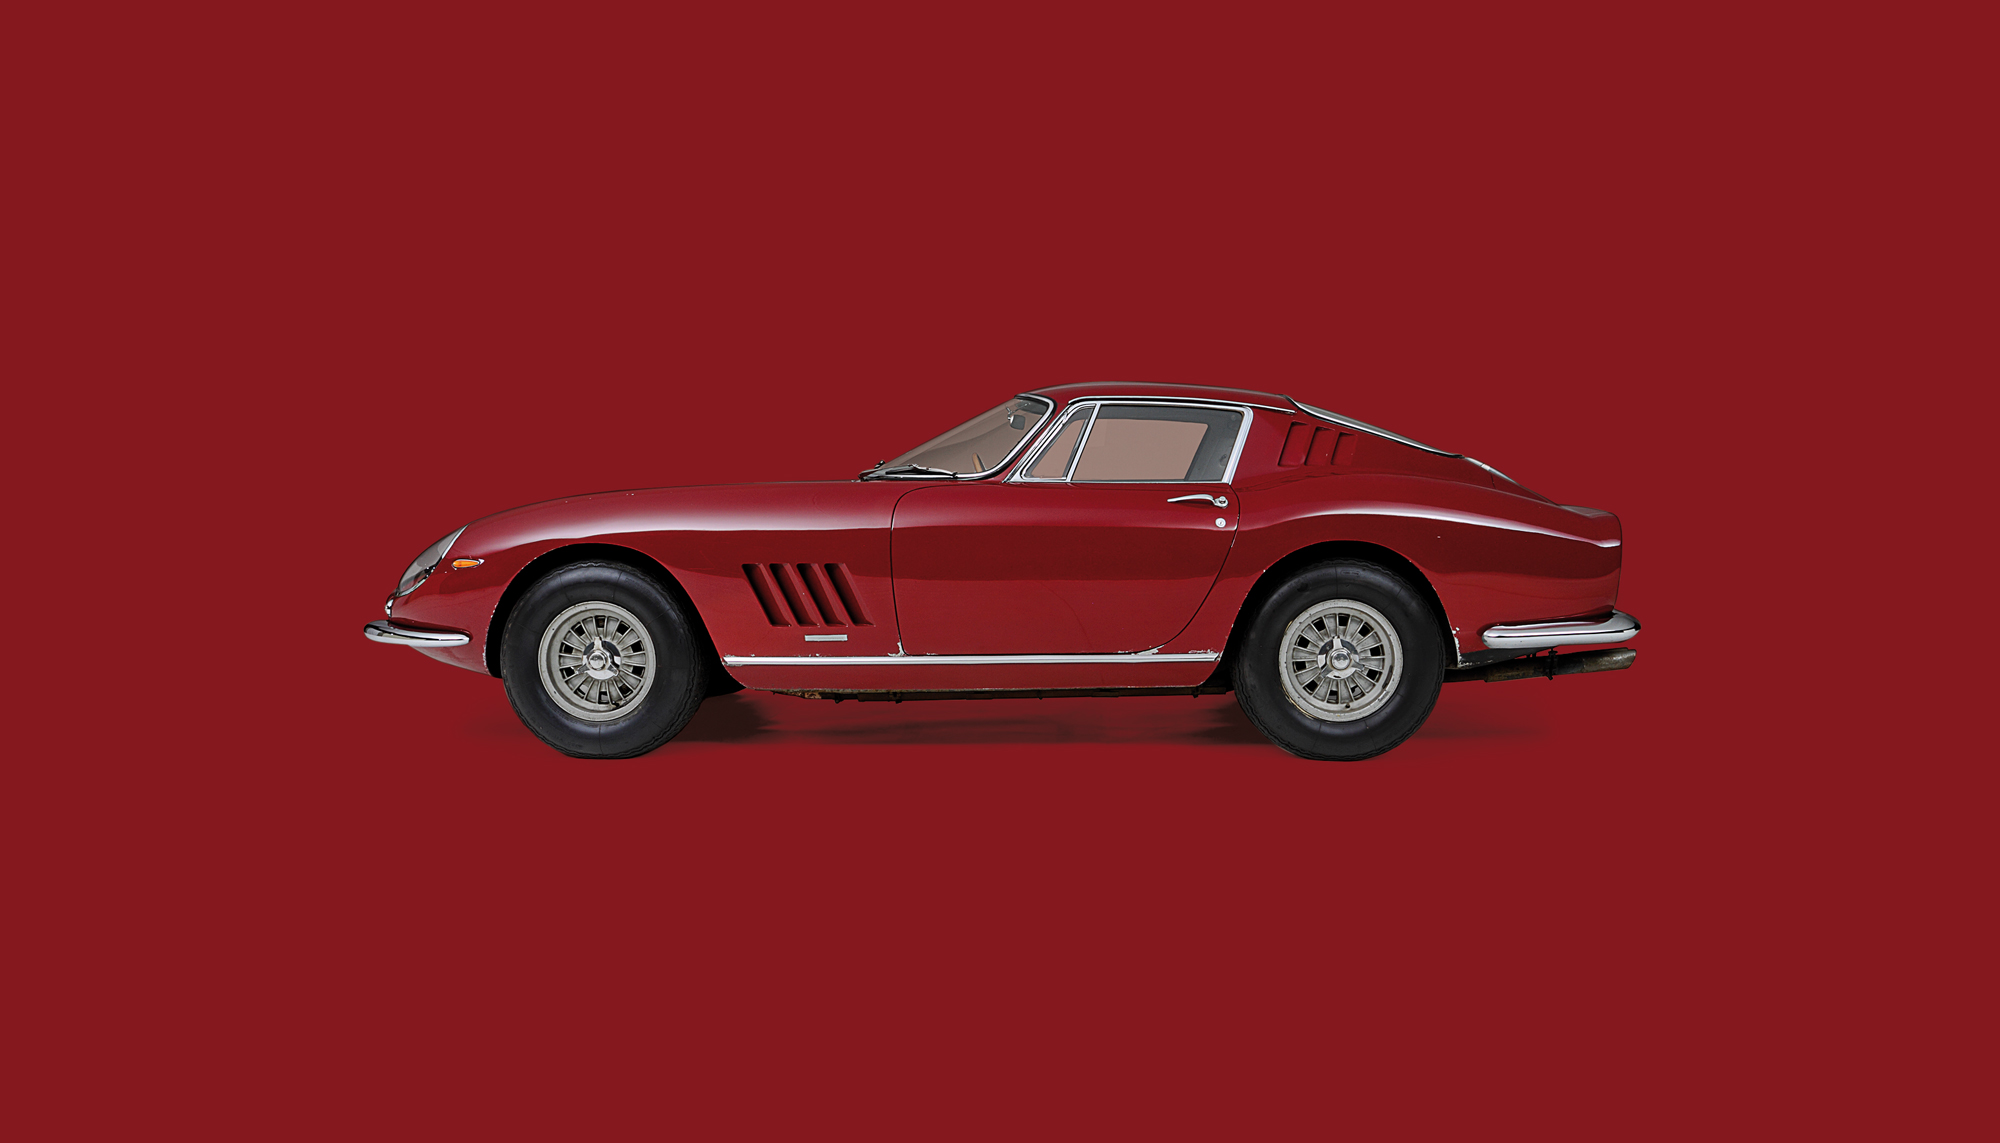 Bekijk Ferrari 275 GTB Lightweight in het Louwman Museum